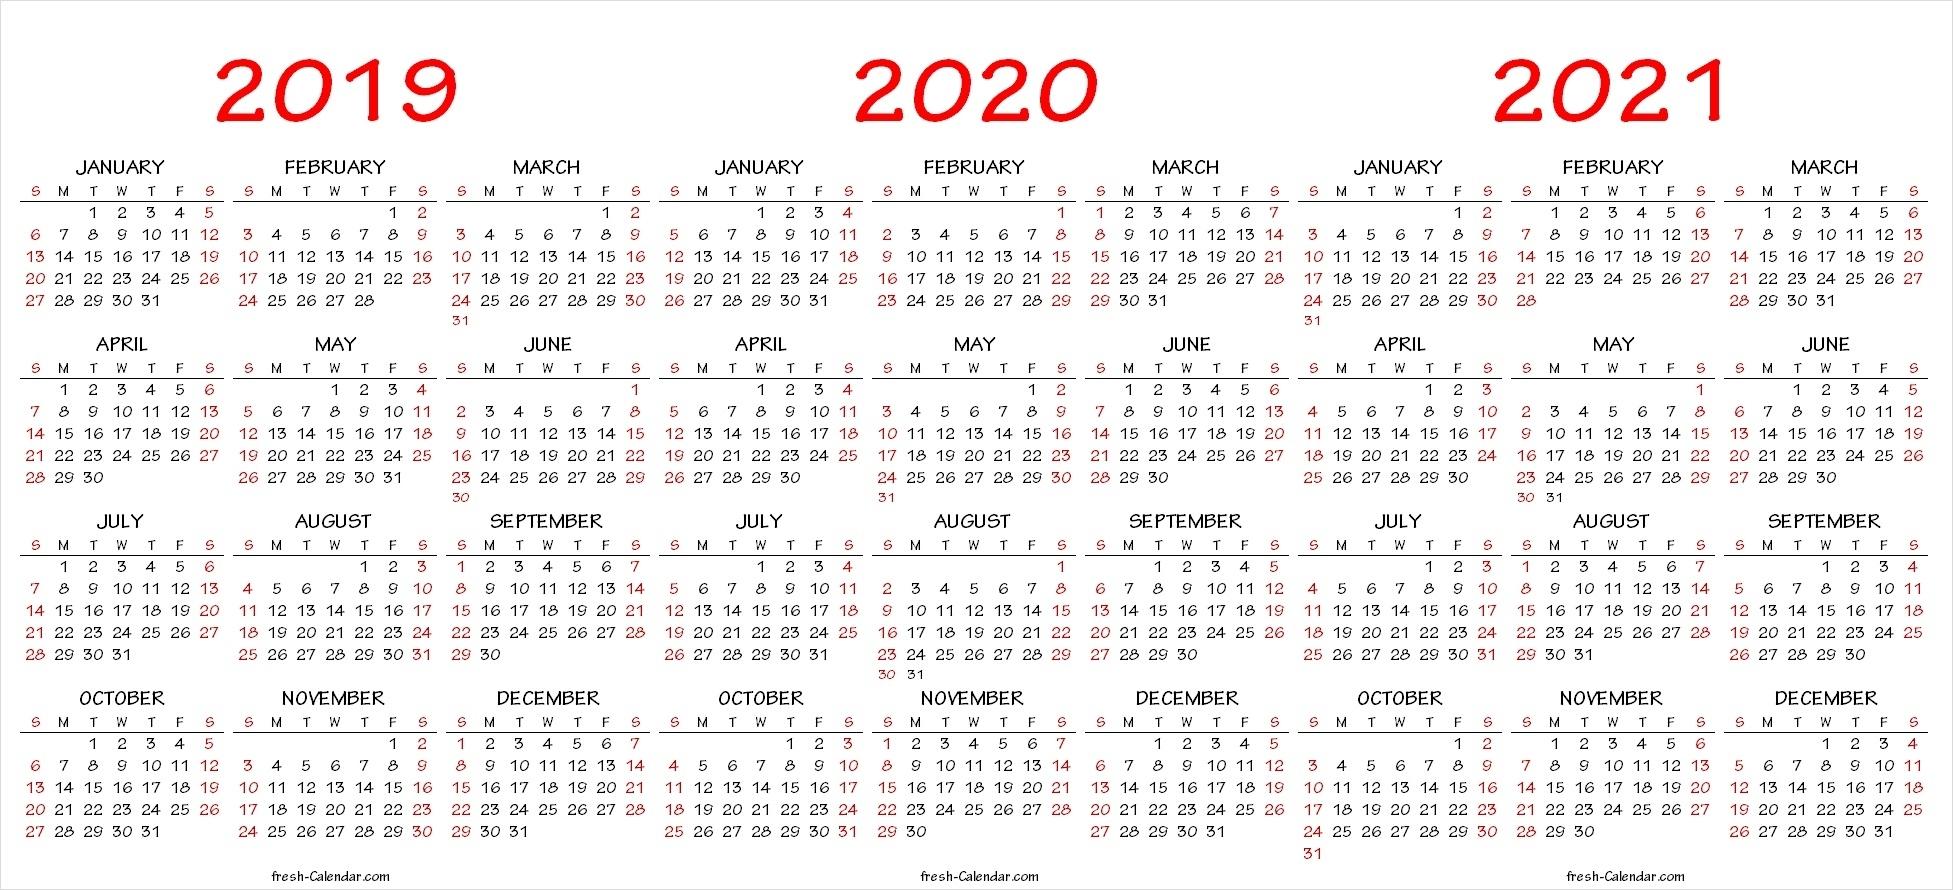 Three Yearly Calendar 2019 2020 2021 Printable Free | Blank regarding Three-Year Calendar 2019 2020 2021